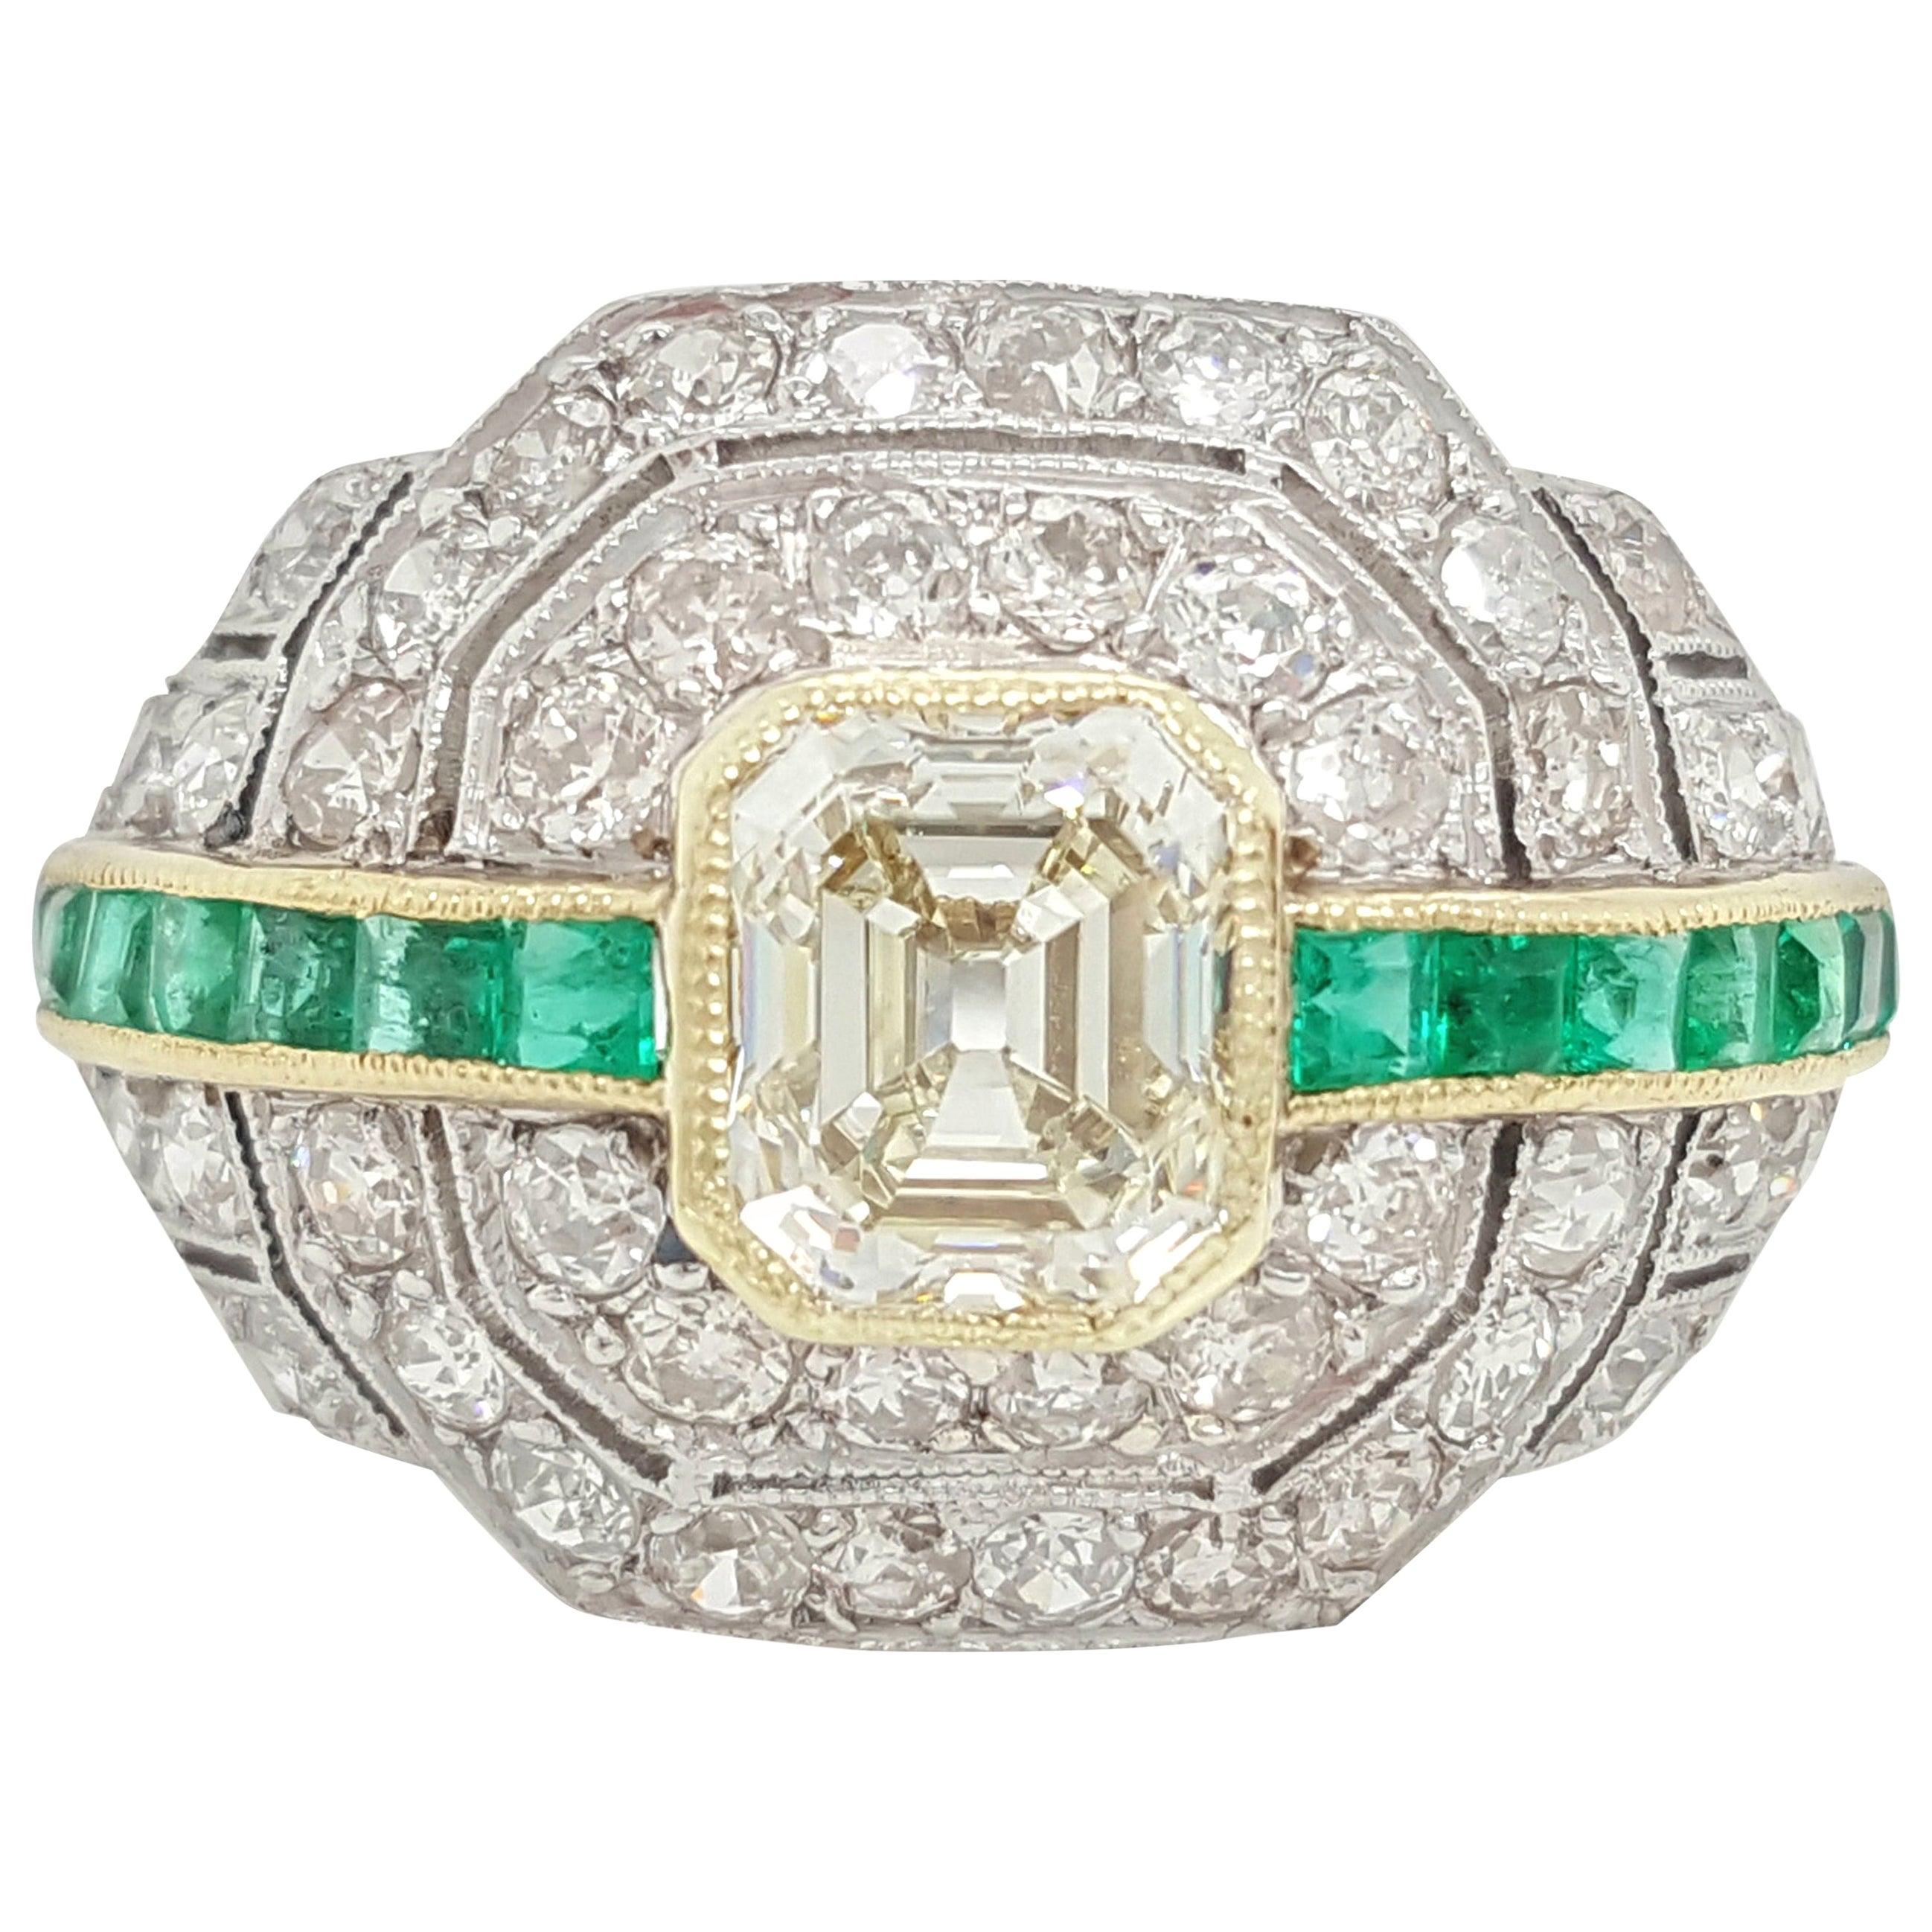 Art Deco 1.24 Carat Emerald Cut Diamond and Emerald Platinum Ring